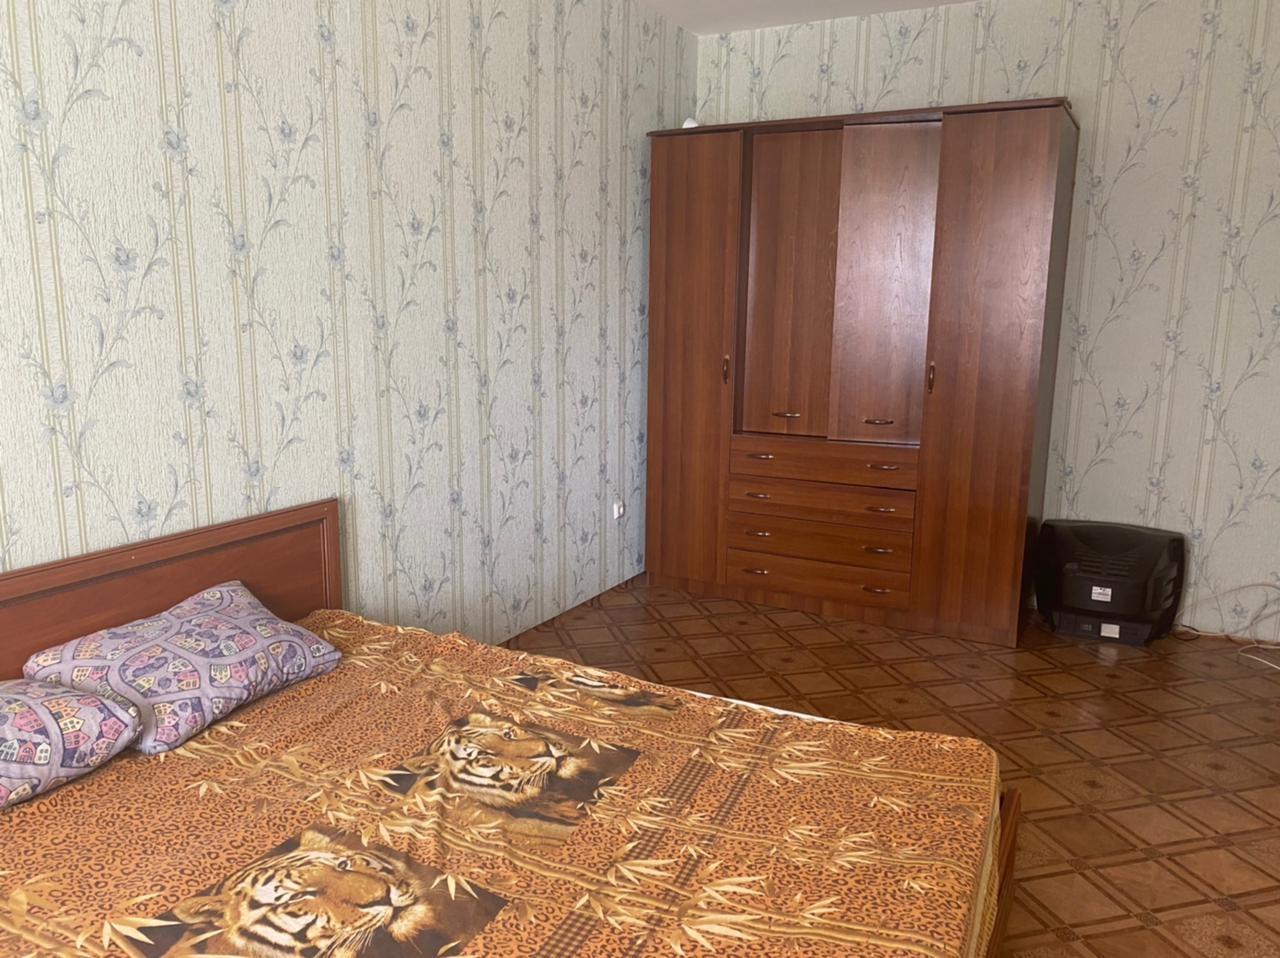 1к квартира Взлётка, микрорайон БЦ, улица Авиаторов, 25 | 18500 | аренда в Красноярске фото 1